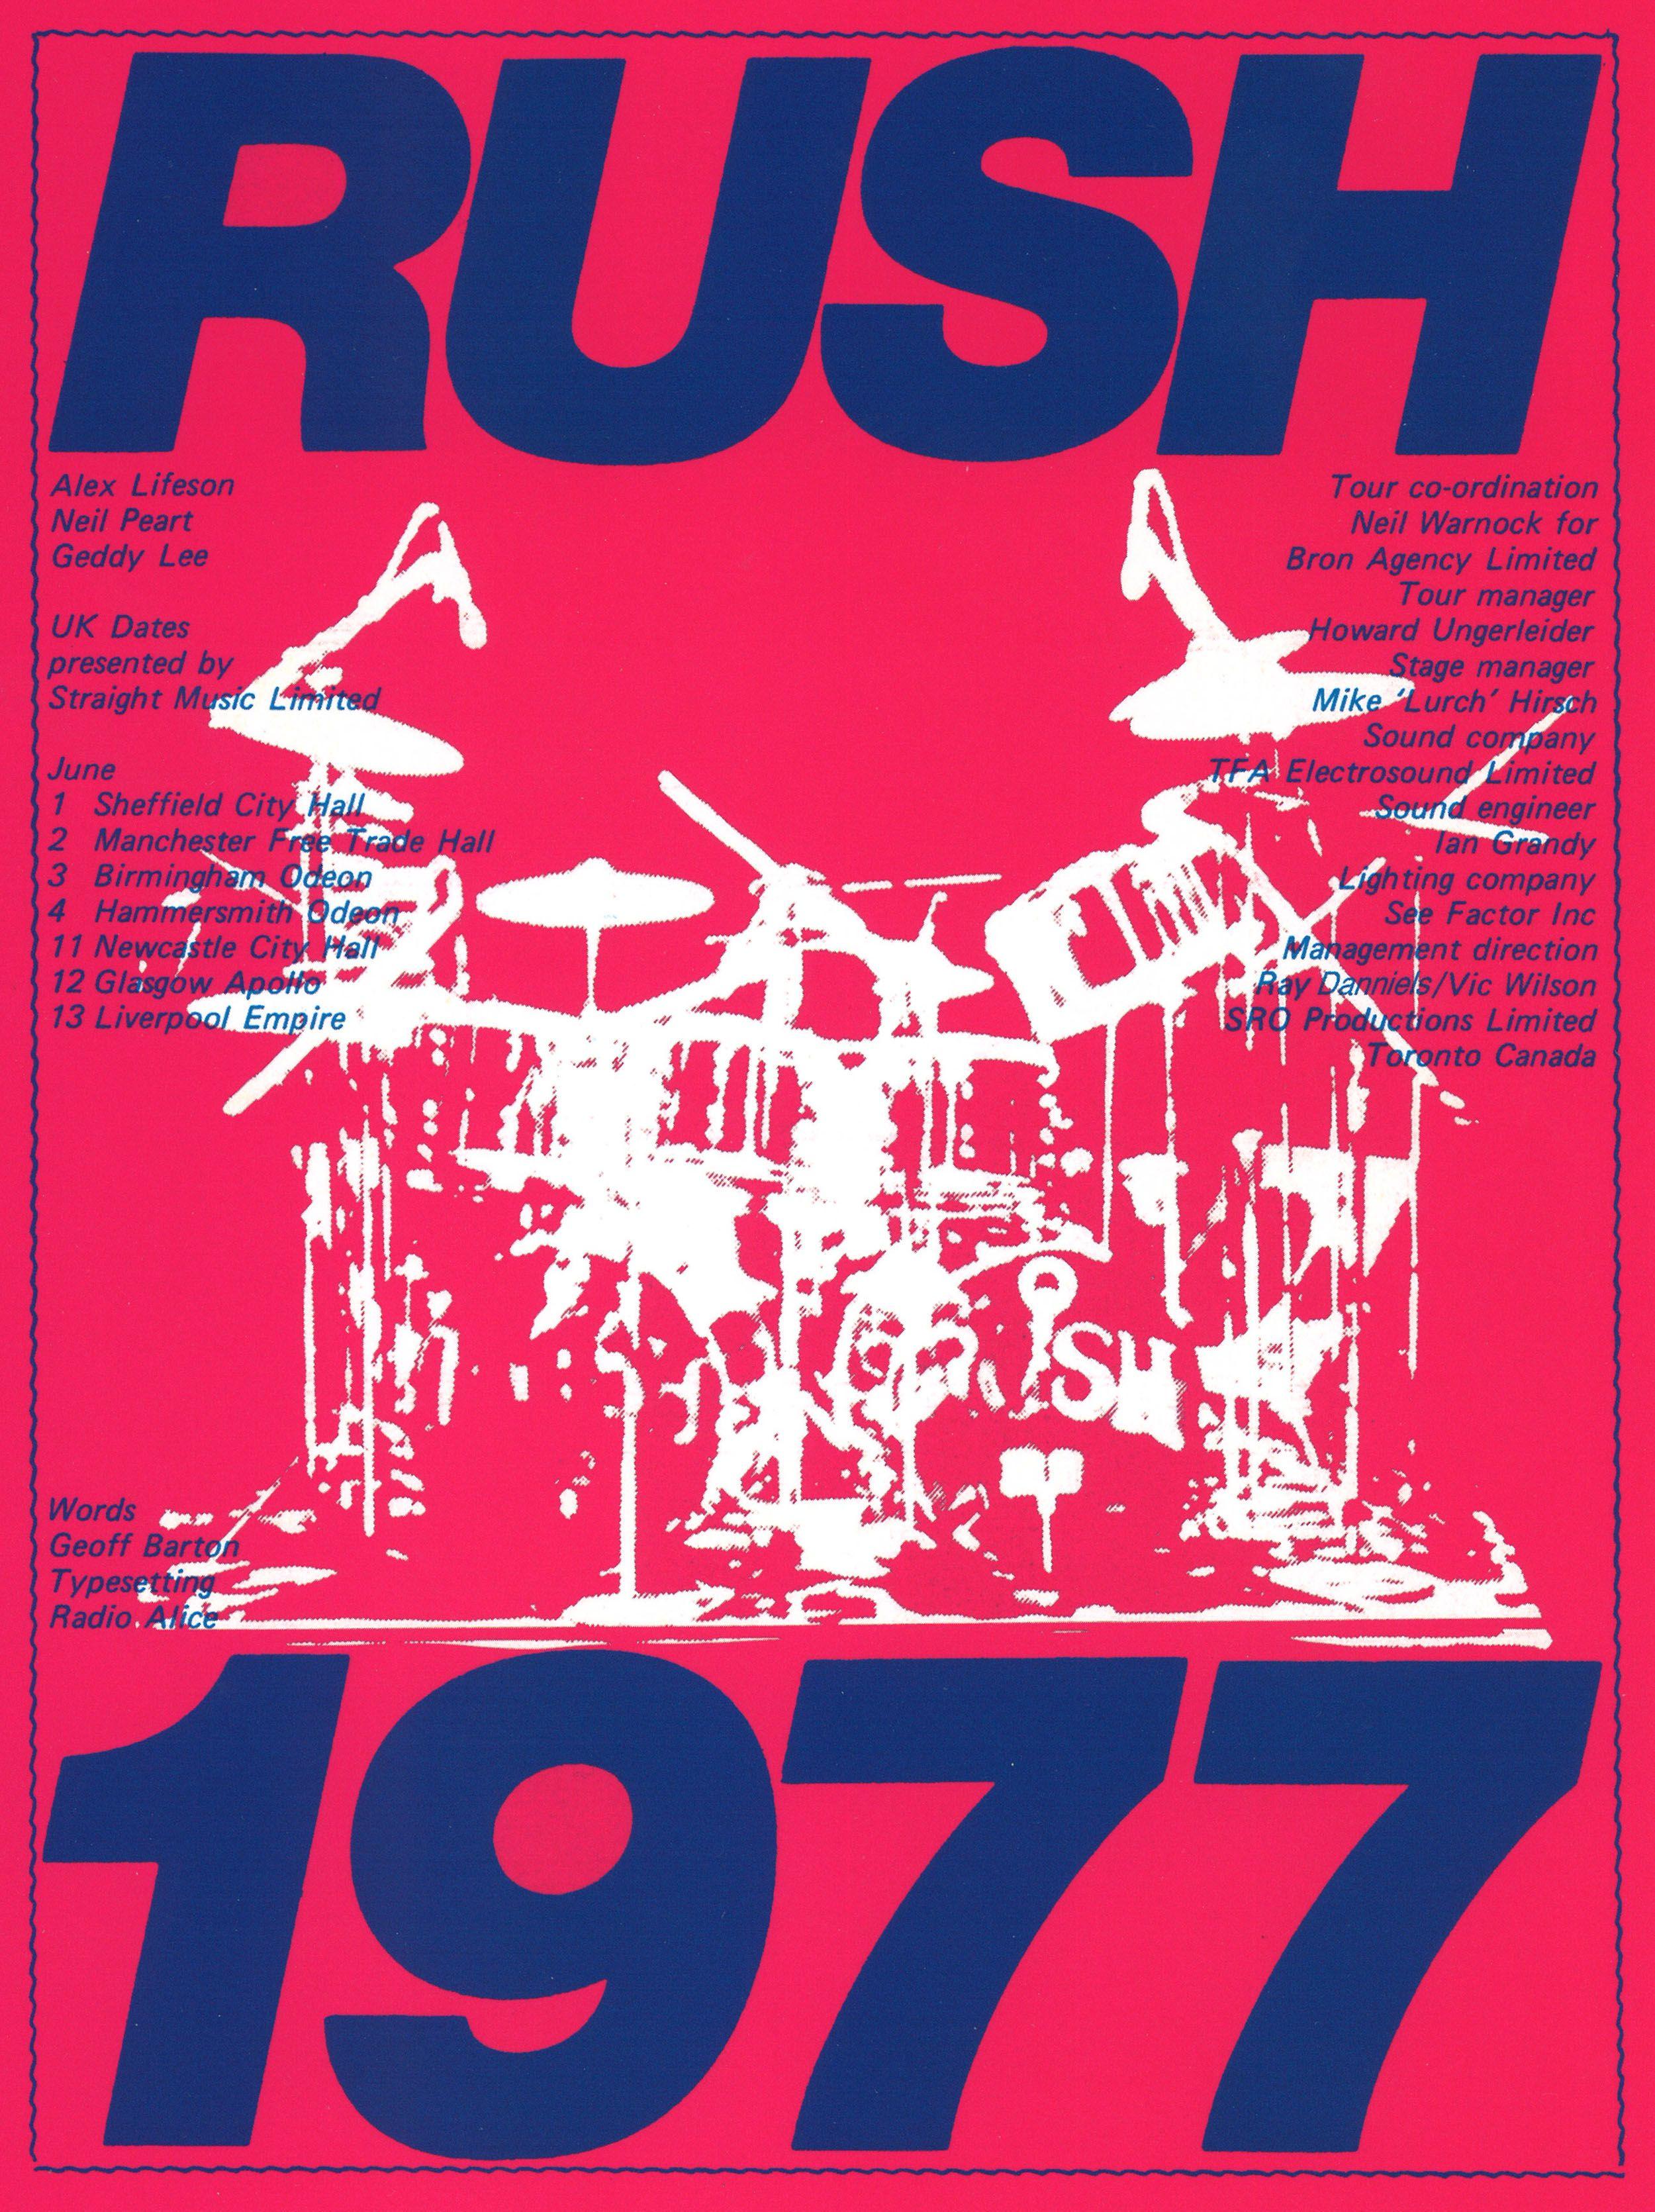 Rush: 2112 Tour Book